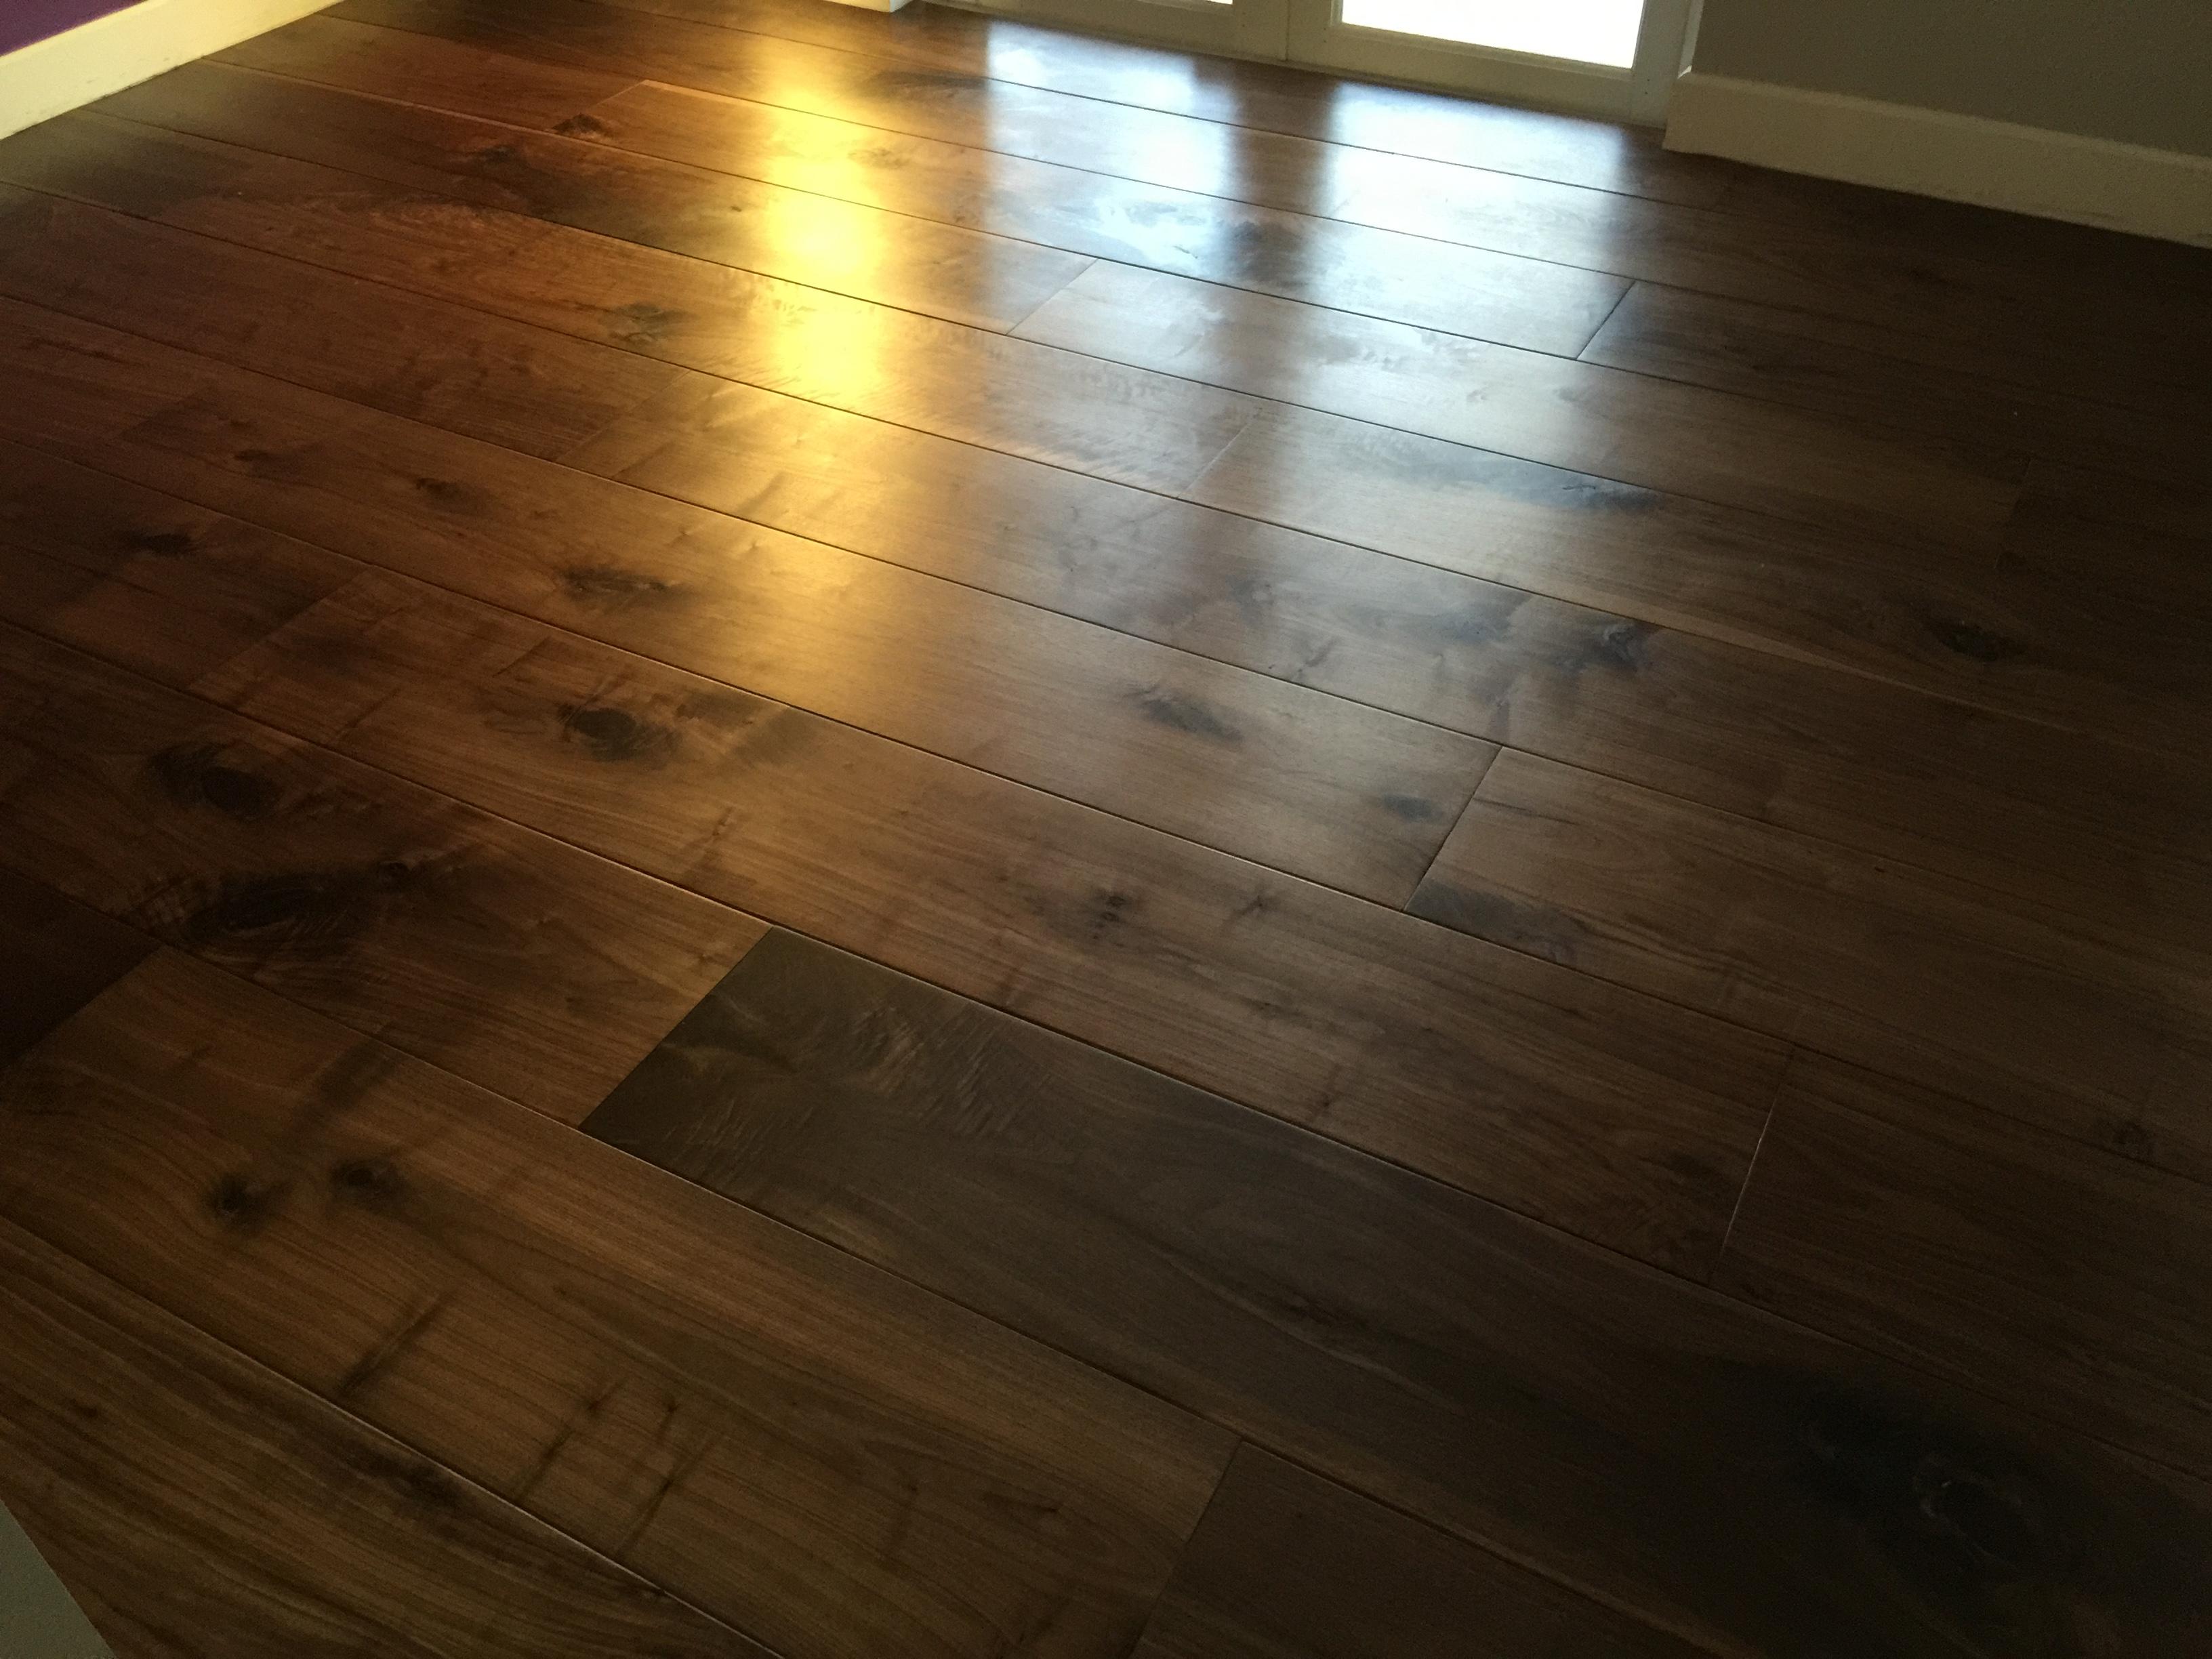 finished-odies-oil-jtstudiollc-floor-7.jpg